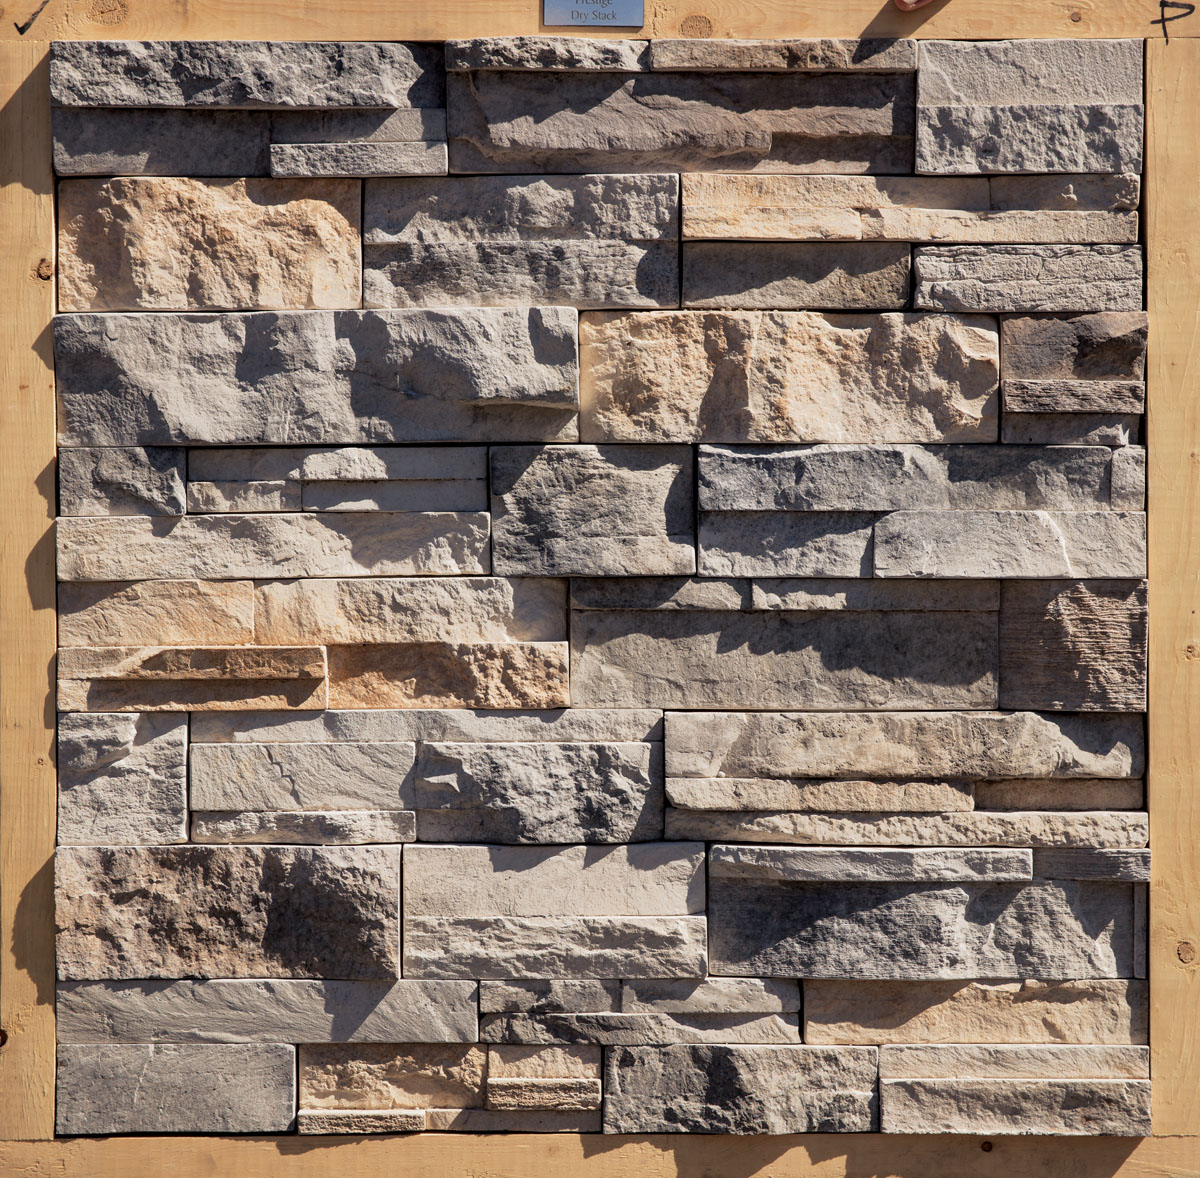 Sienna Castle Rock >> Dutch Quality Stone Drystack Sienna Flat - Manufactured Stone Supply